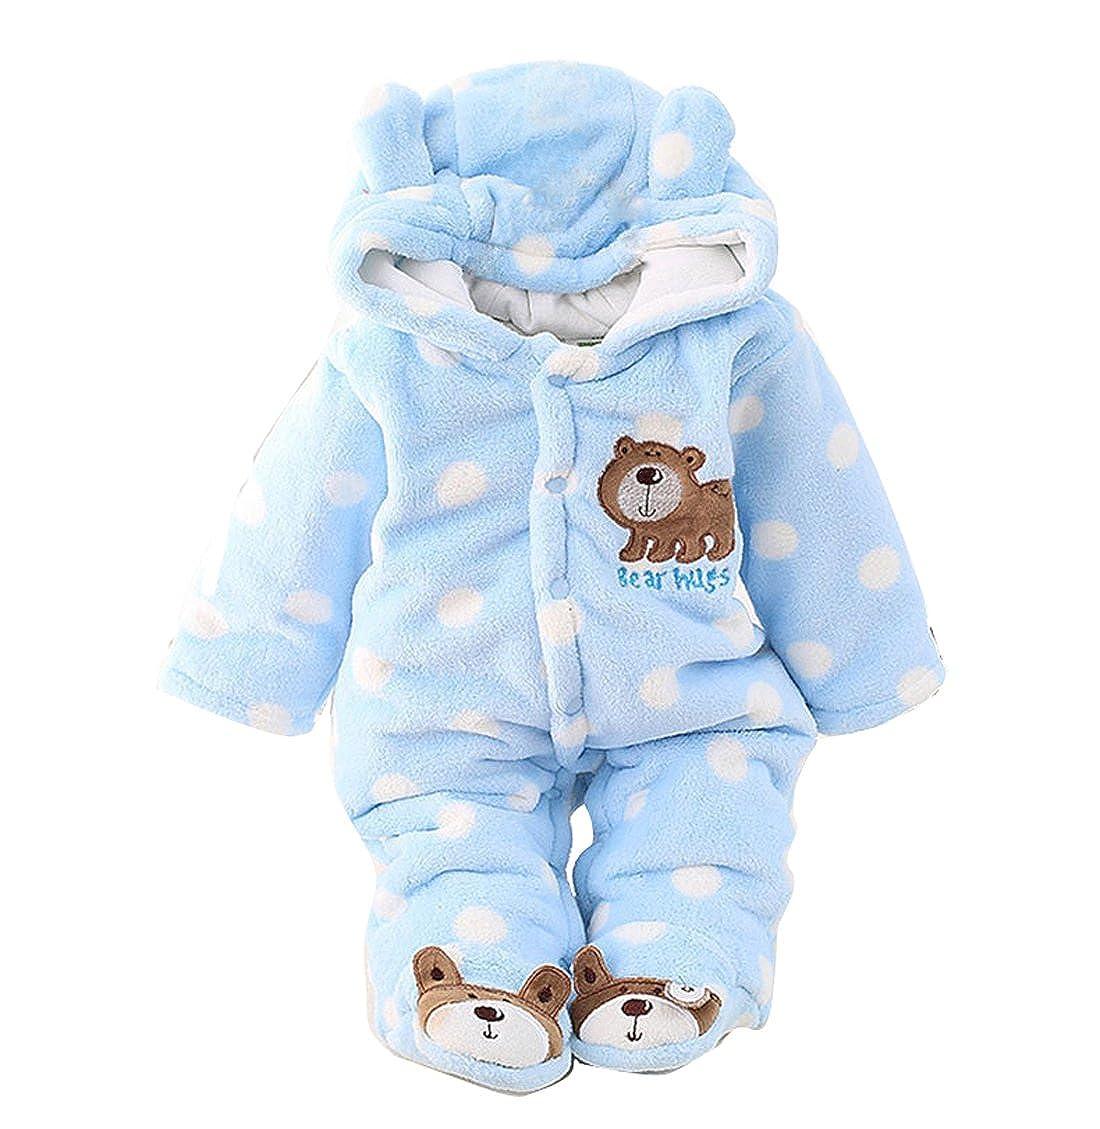 Gaorui Newborn Unisex Baby Winter Jumpsuit Hooded Romper Fleece Onesie All in One Snow Suit Outfits